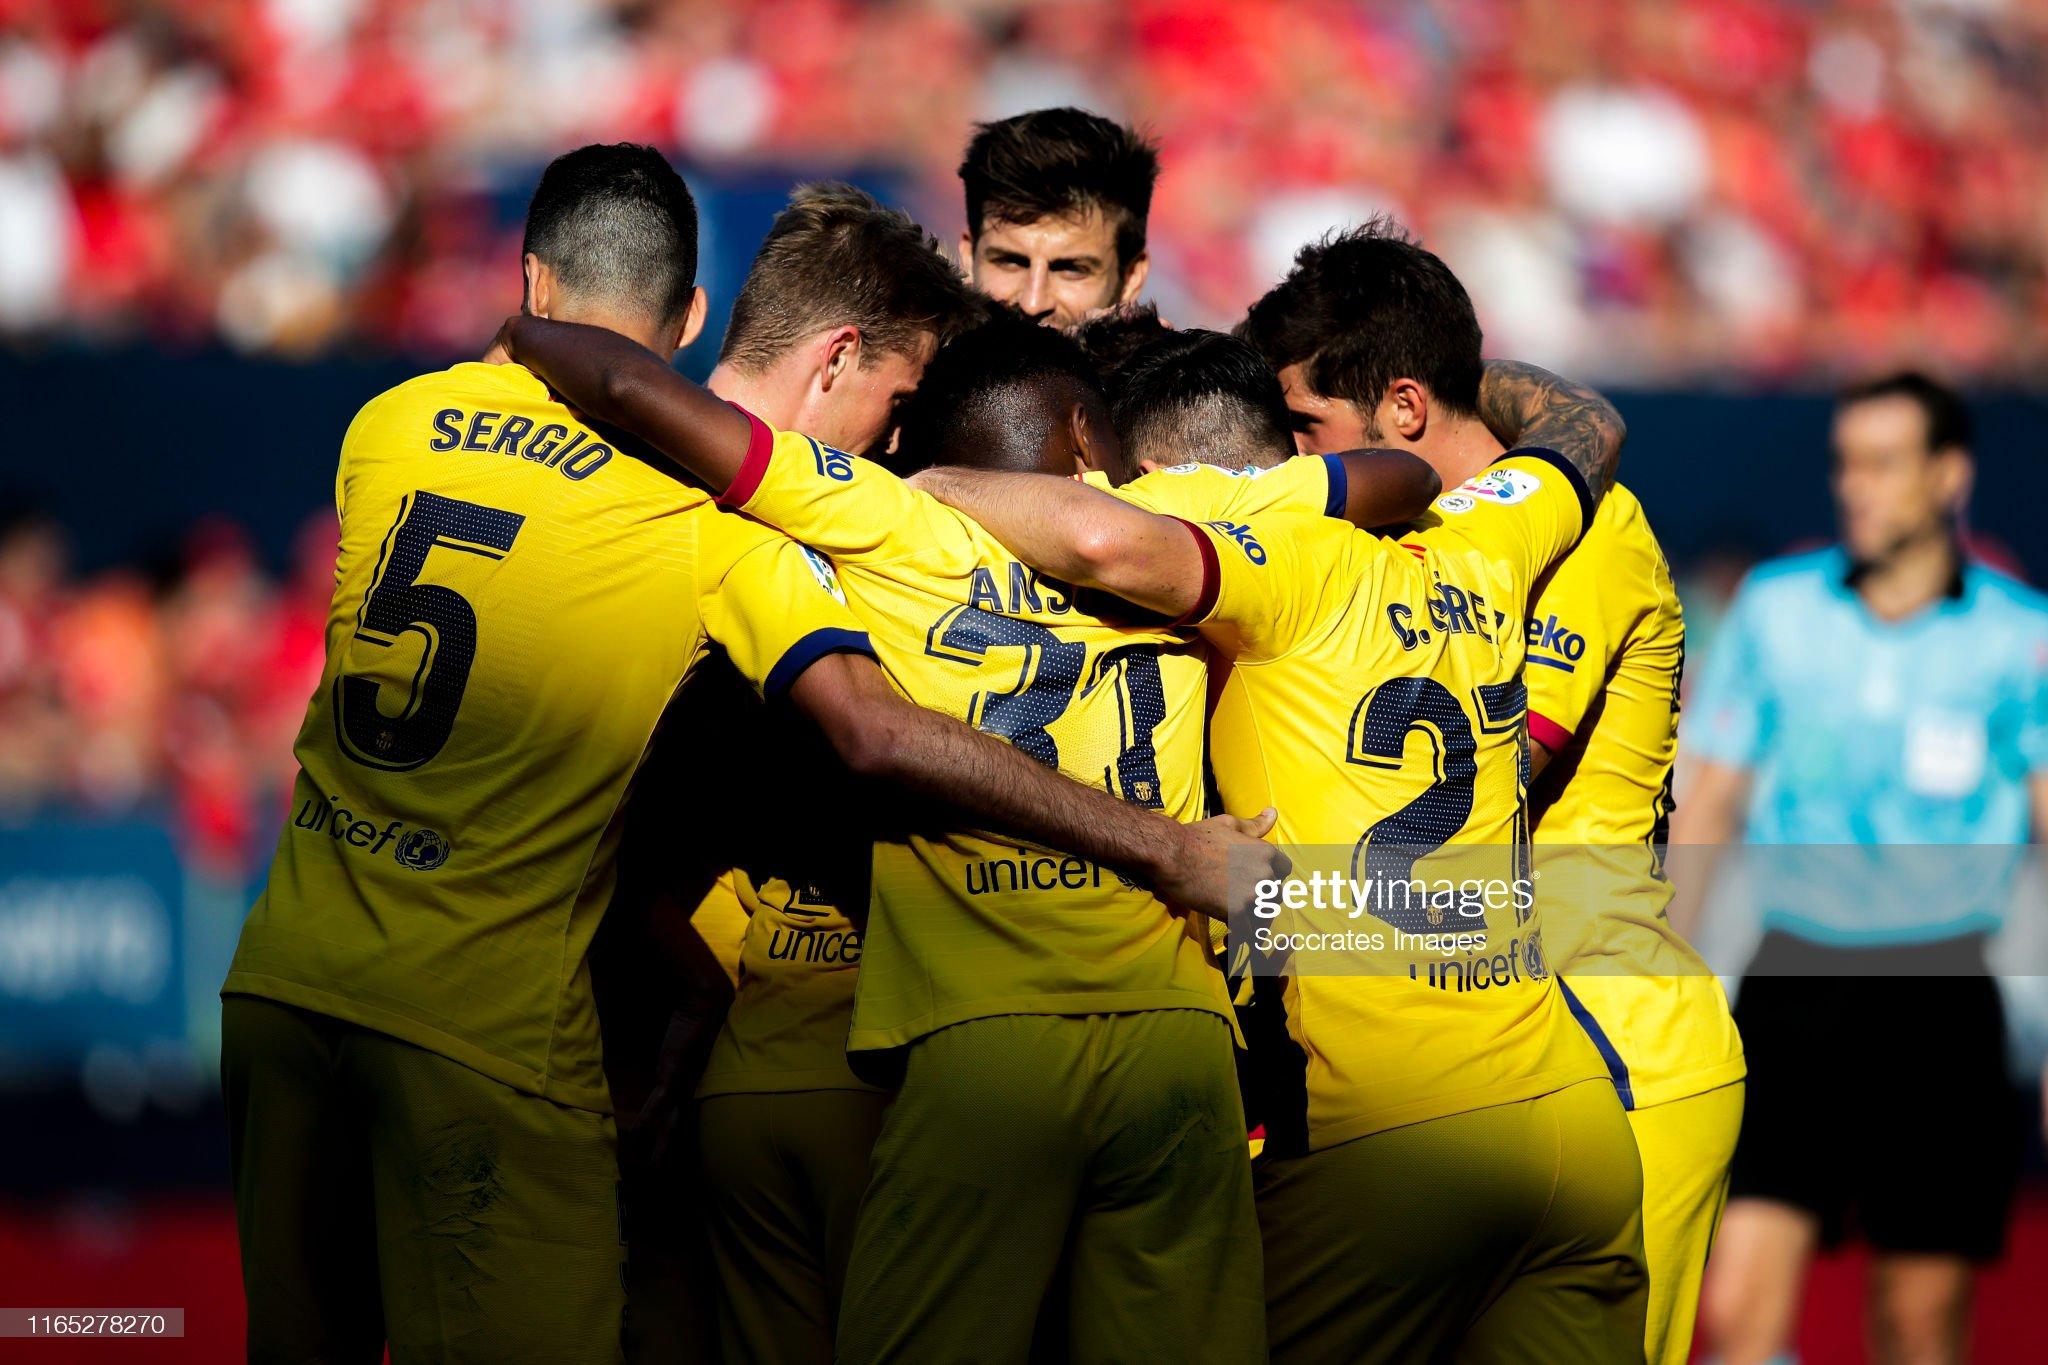 صور مباراة : أوساسونا - برشلونة 2-2 ( 31-08-2019 )  Ansu-fati-of-fc-barcelona-sergio-busquets-of-fc-barcelona-jordi-alba-picture-id1165278270?s=2048x2048